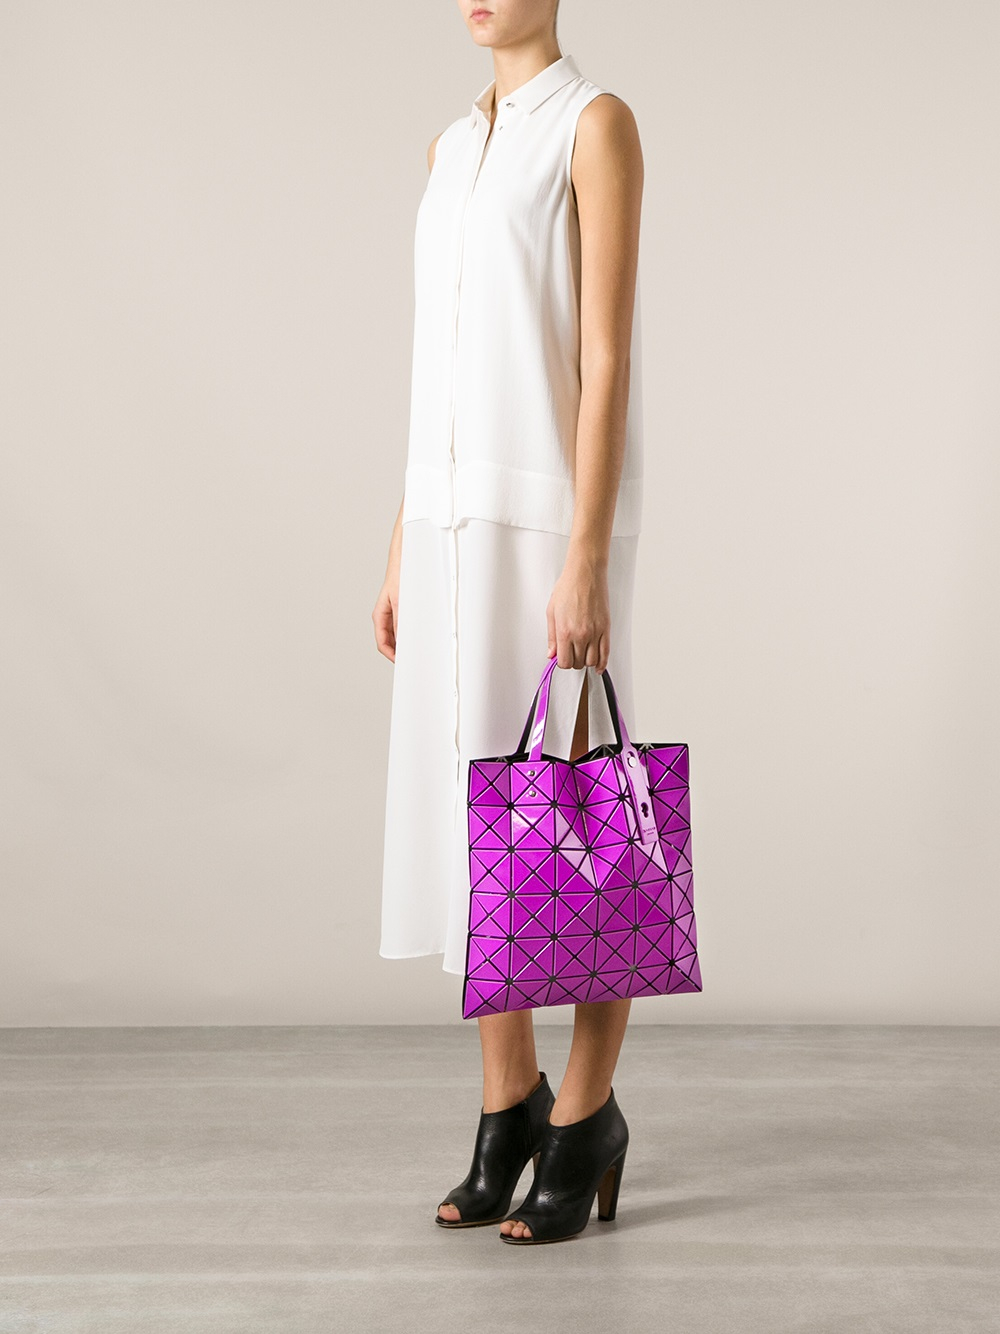 Bao Bao Issey Miyake Geometric Panel Tote Bag in Pink & Purple (Pink)